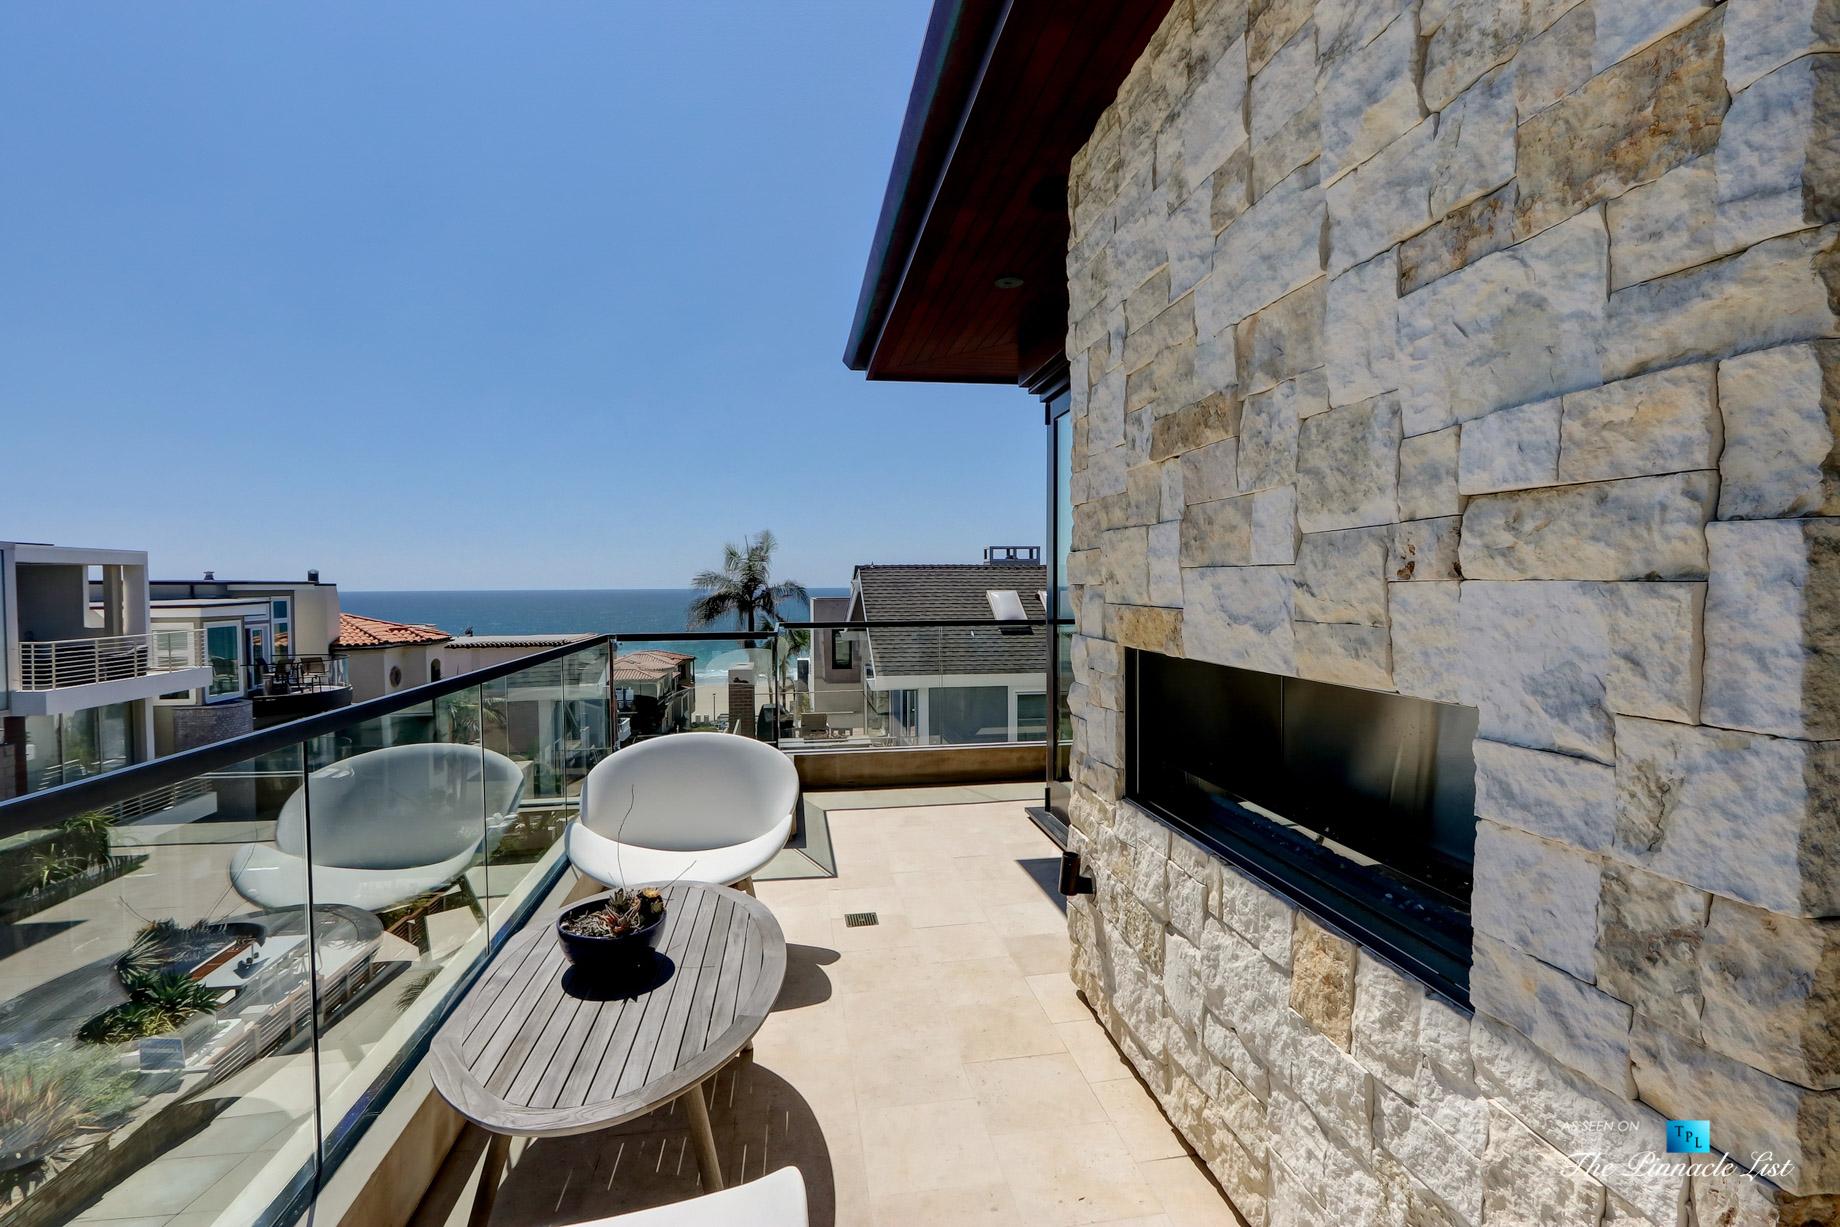 Bespoke Luxury Oceanview Residence - 205 20th St, Manhattan Beach, CA, USA - Deck Ocean View